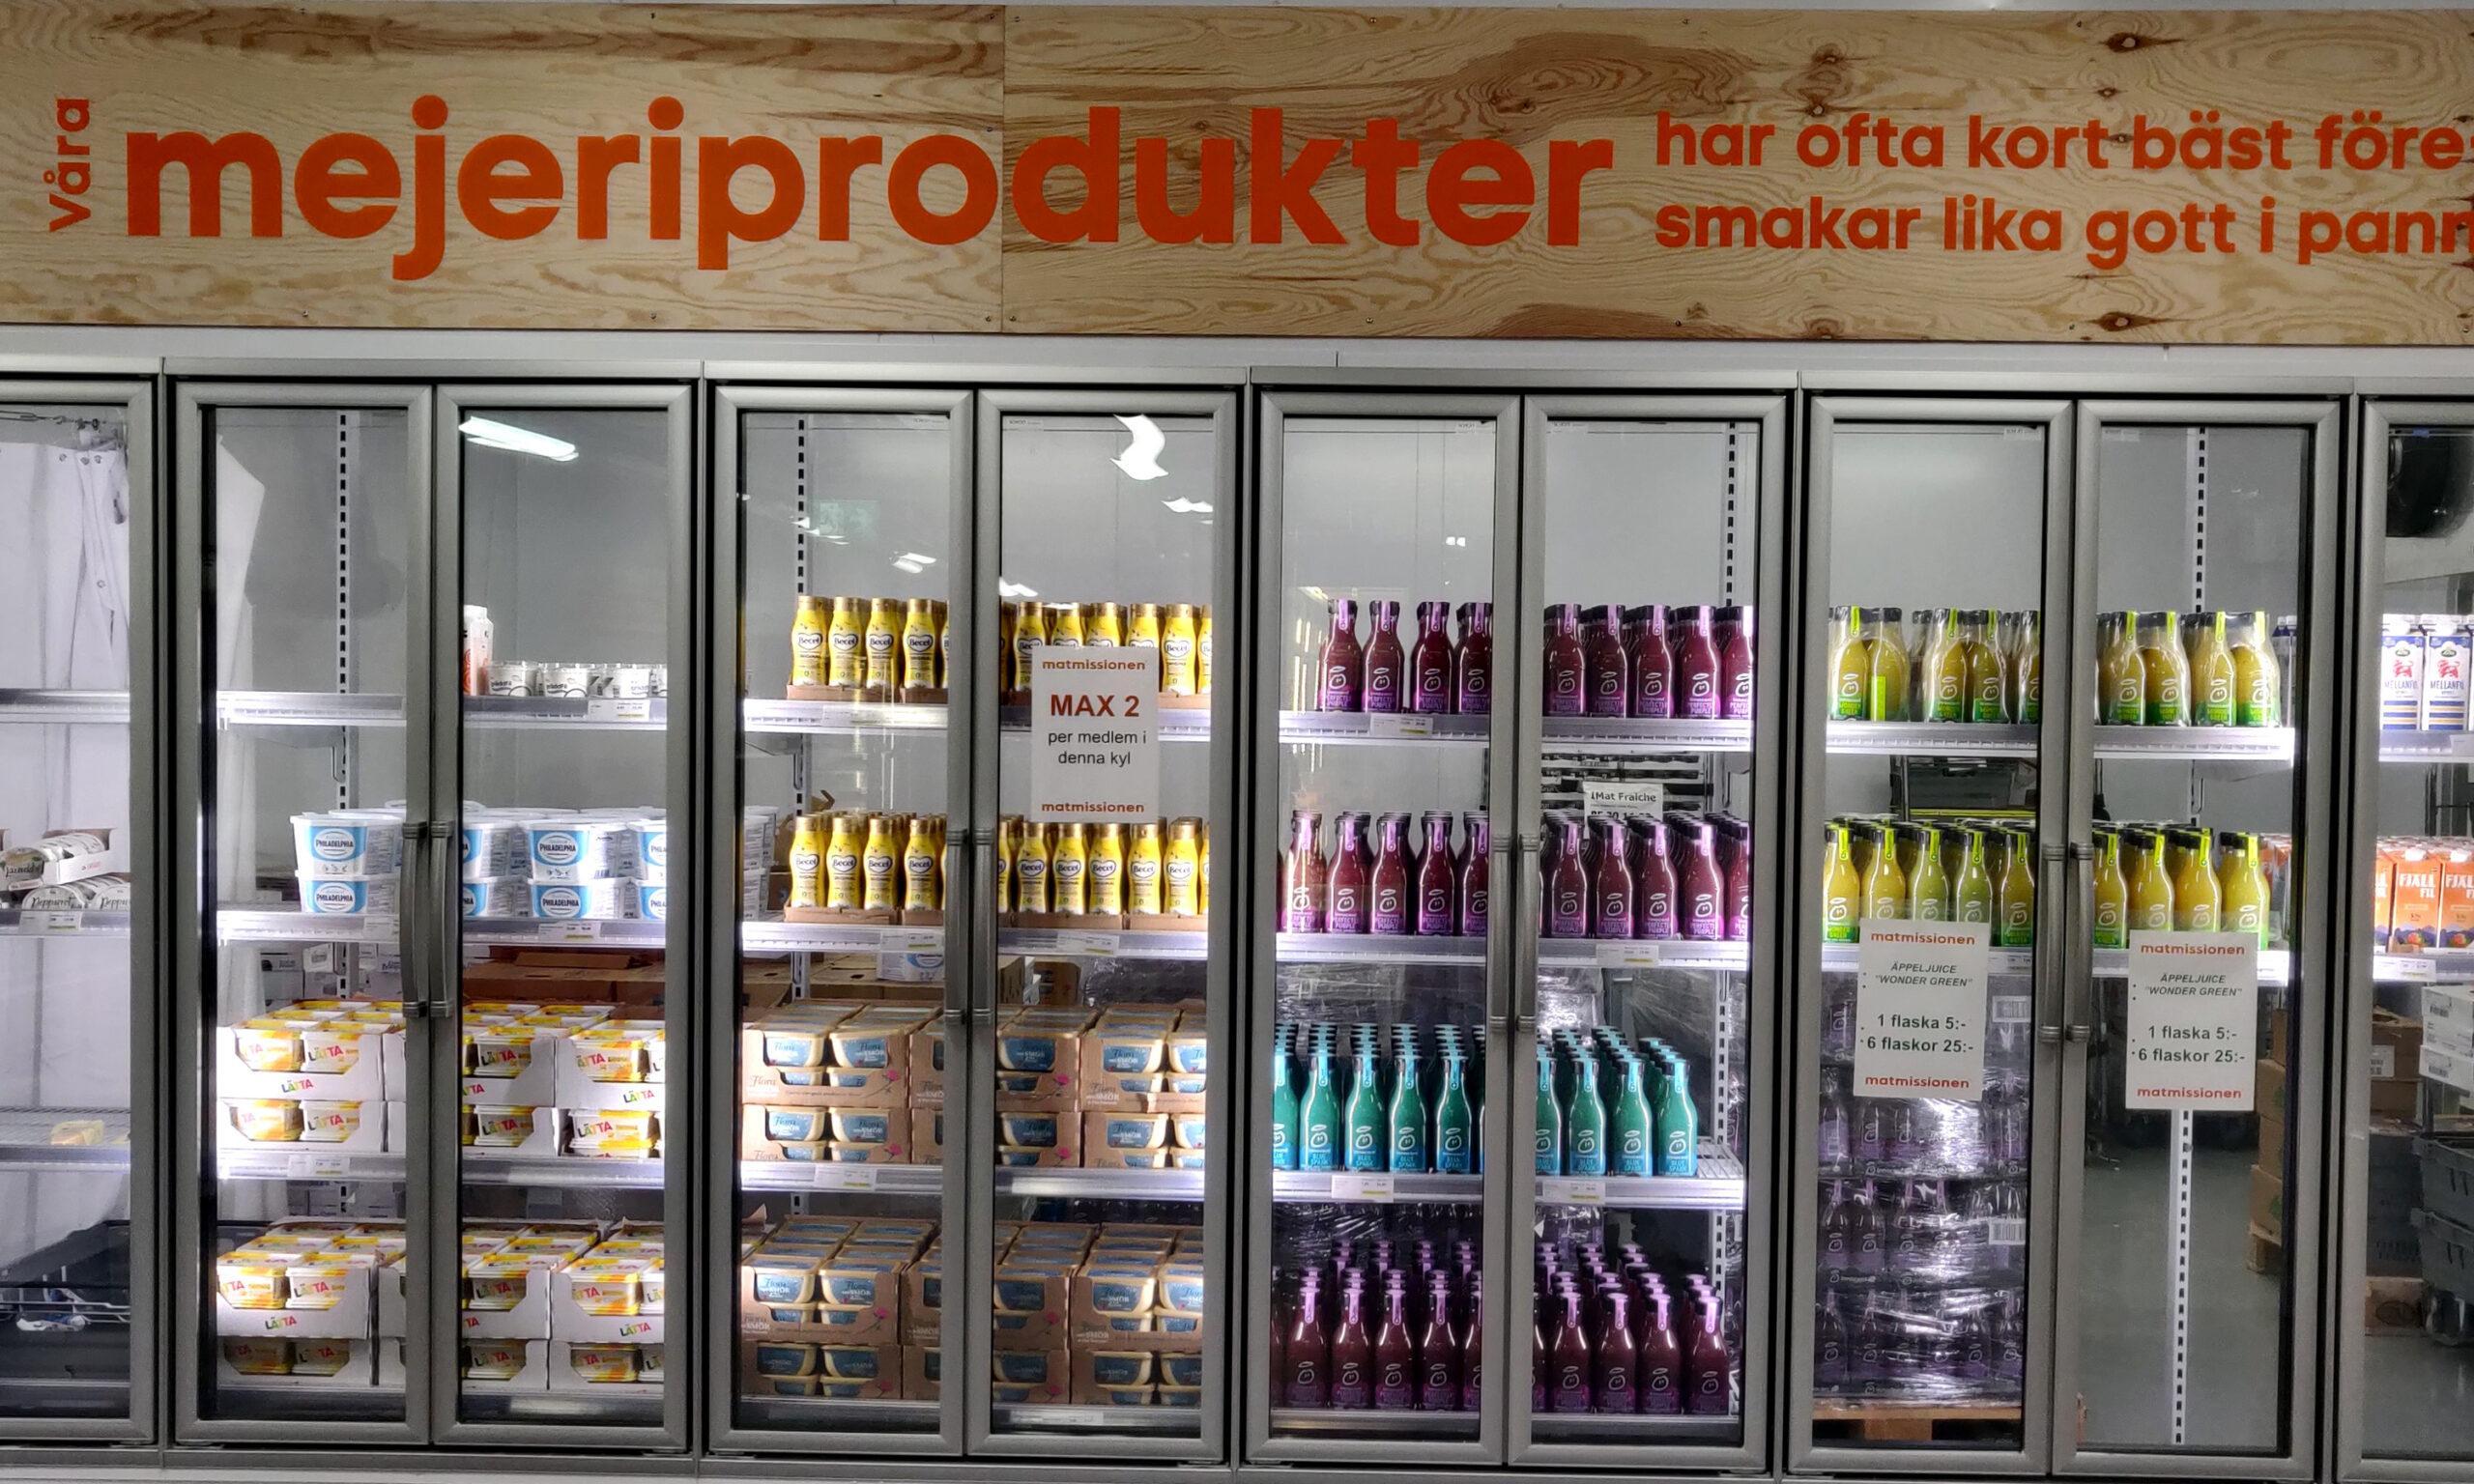 A dairy fridge in the Matmissionen supermarket.